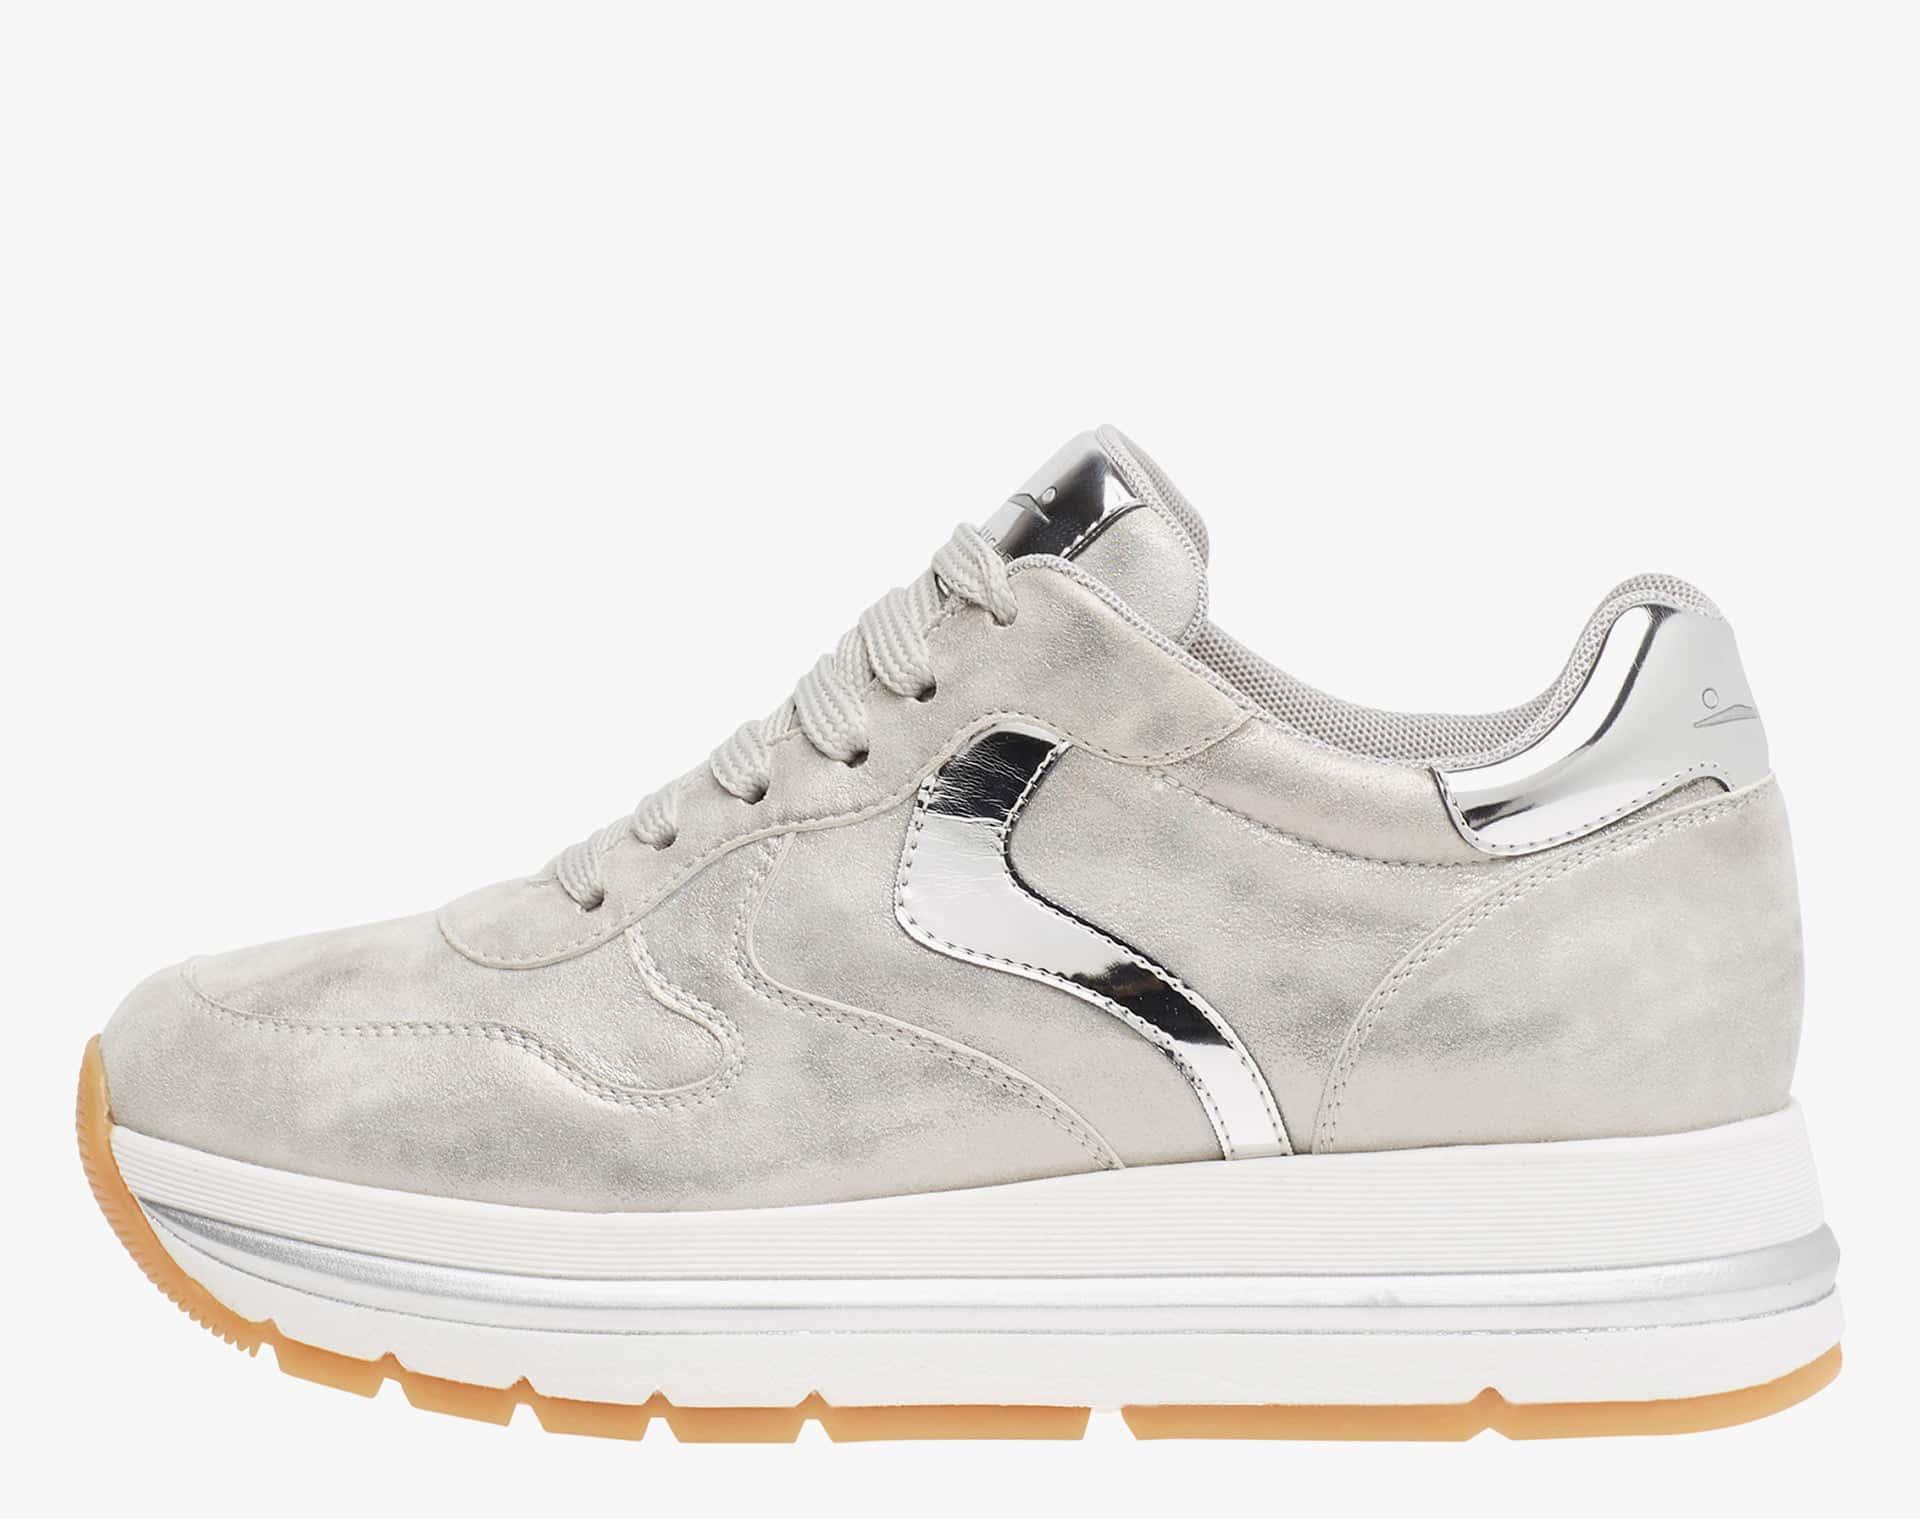 MARAN - Sneaker in vitello laminato argento - Argento